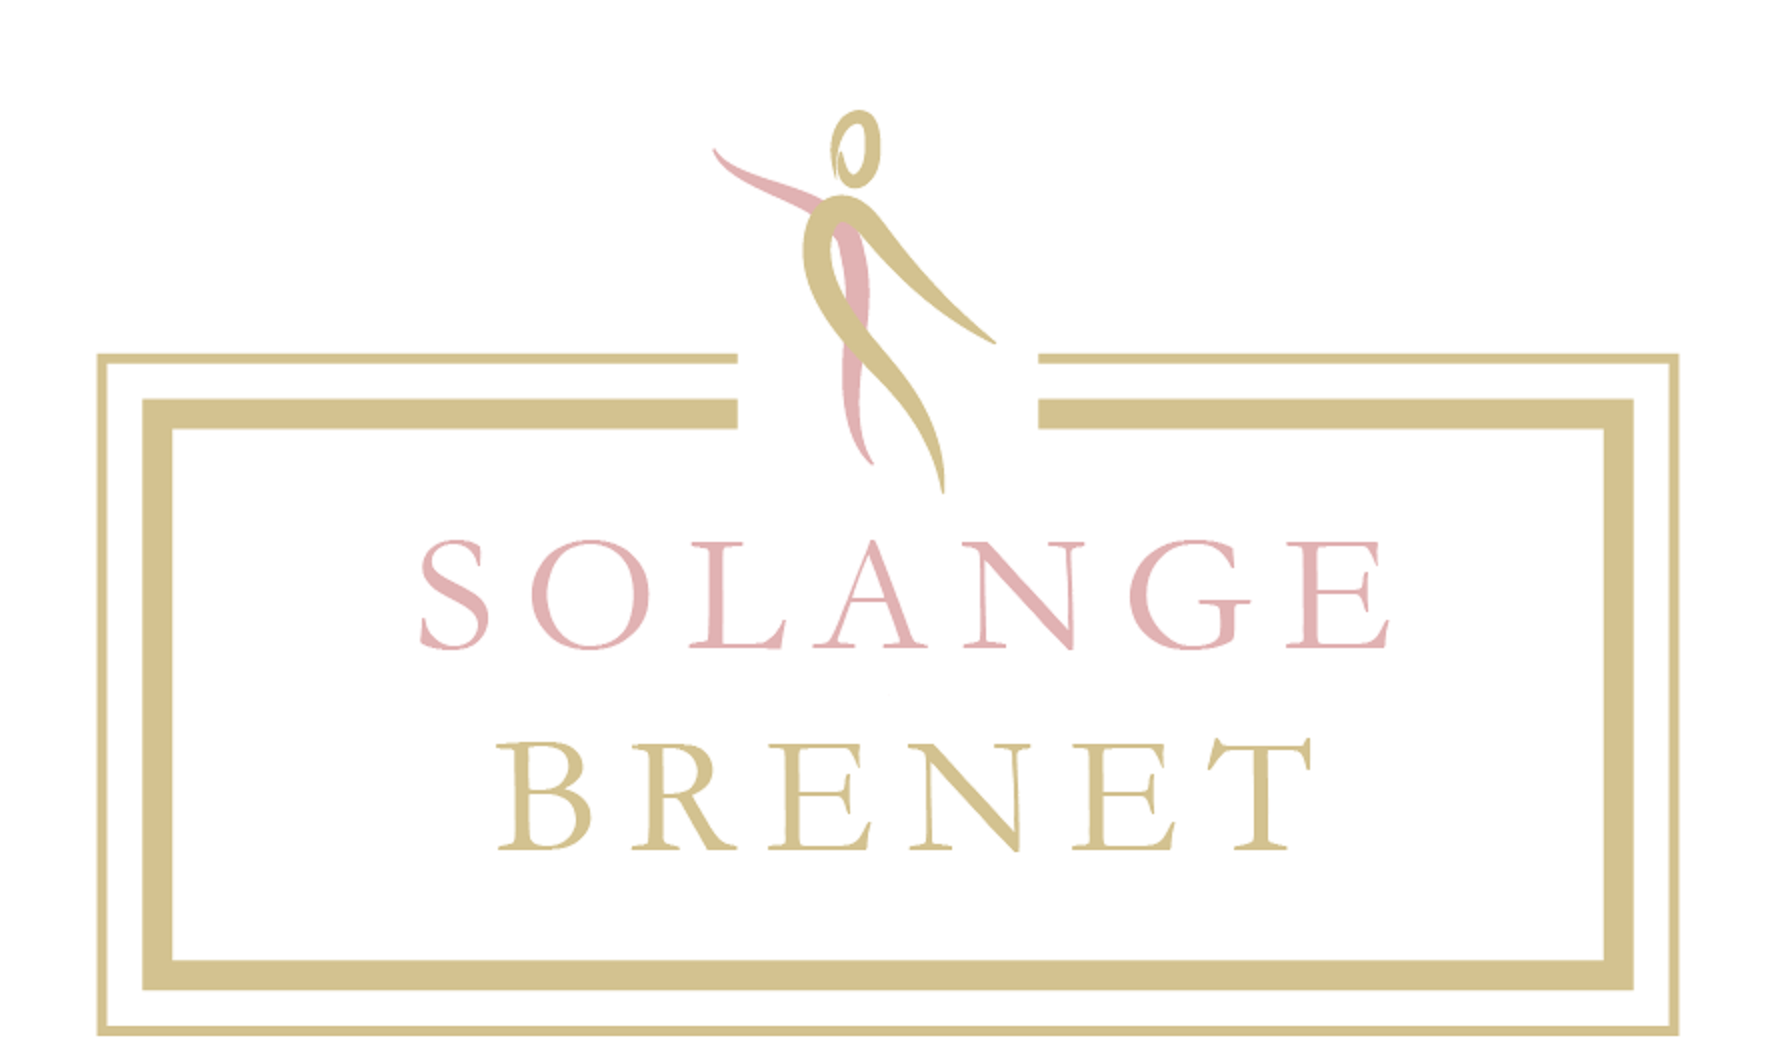 Solangebrenet.com